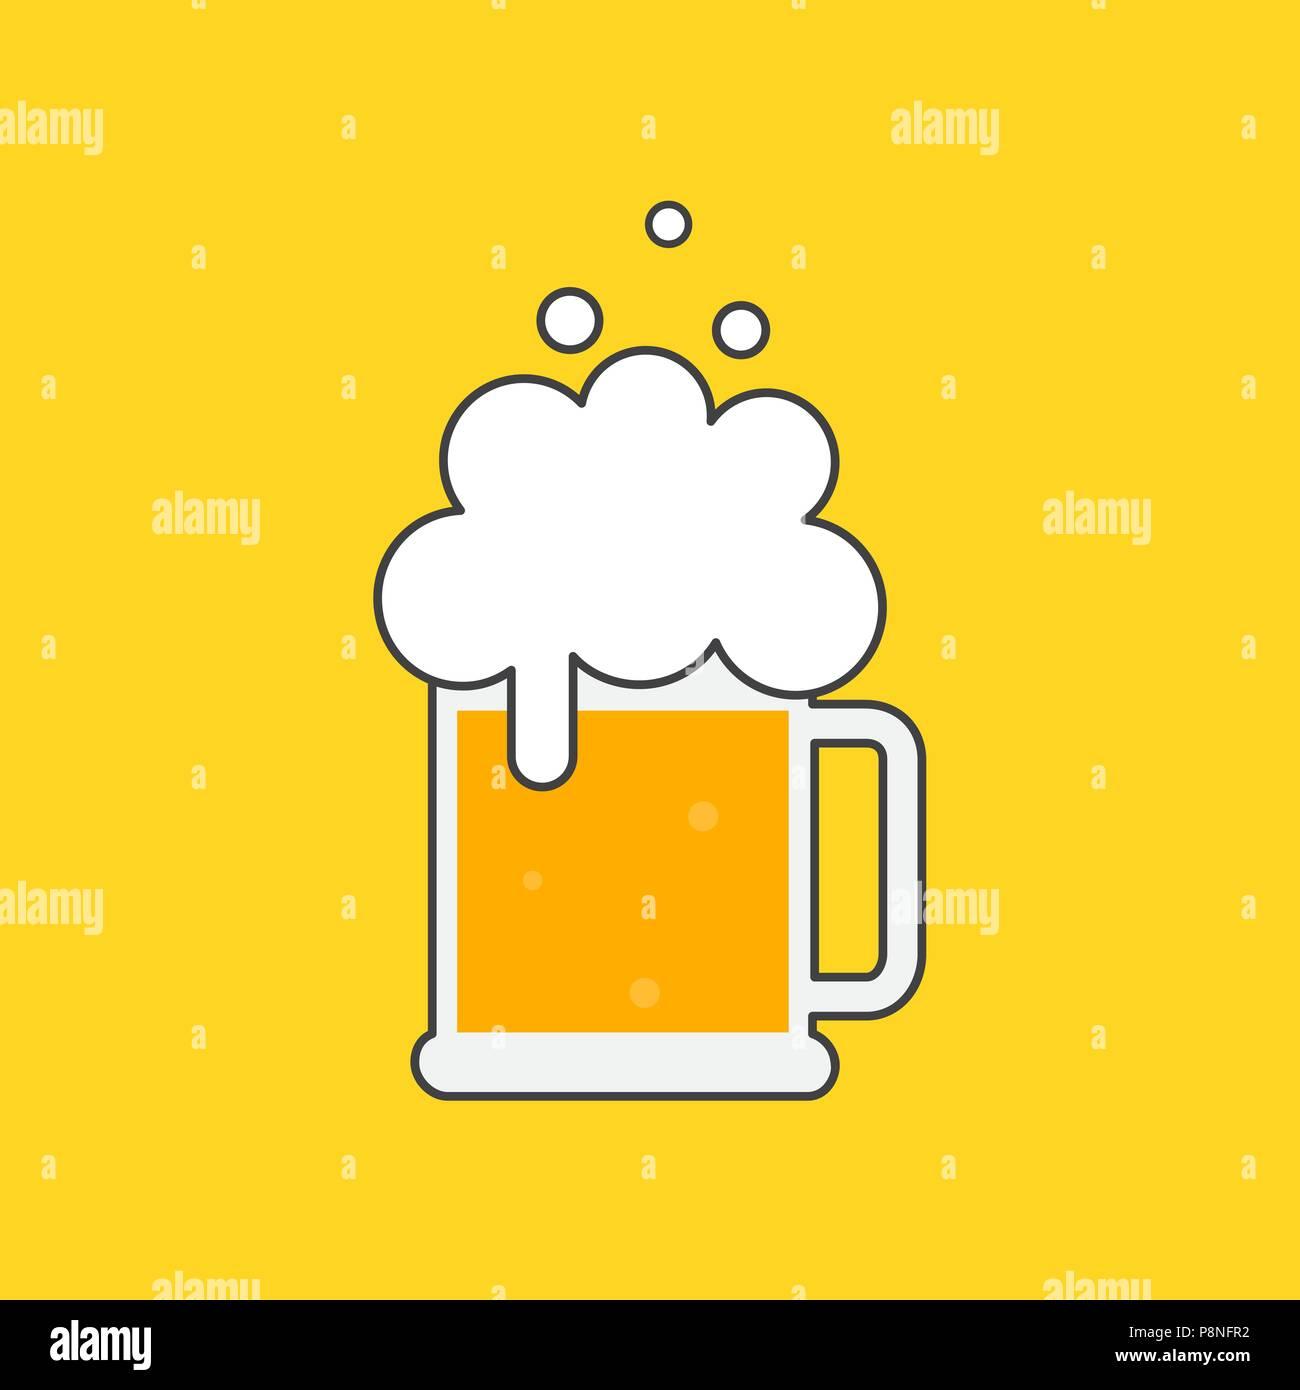 Beer Mug With Foam Symbol Template Logo Vector Illustration Flat Design Isolated Stock Vector Image Art Alamy